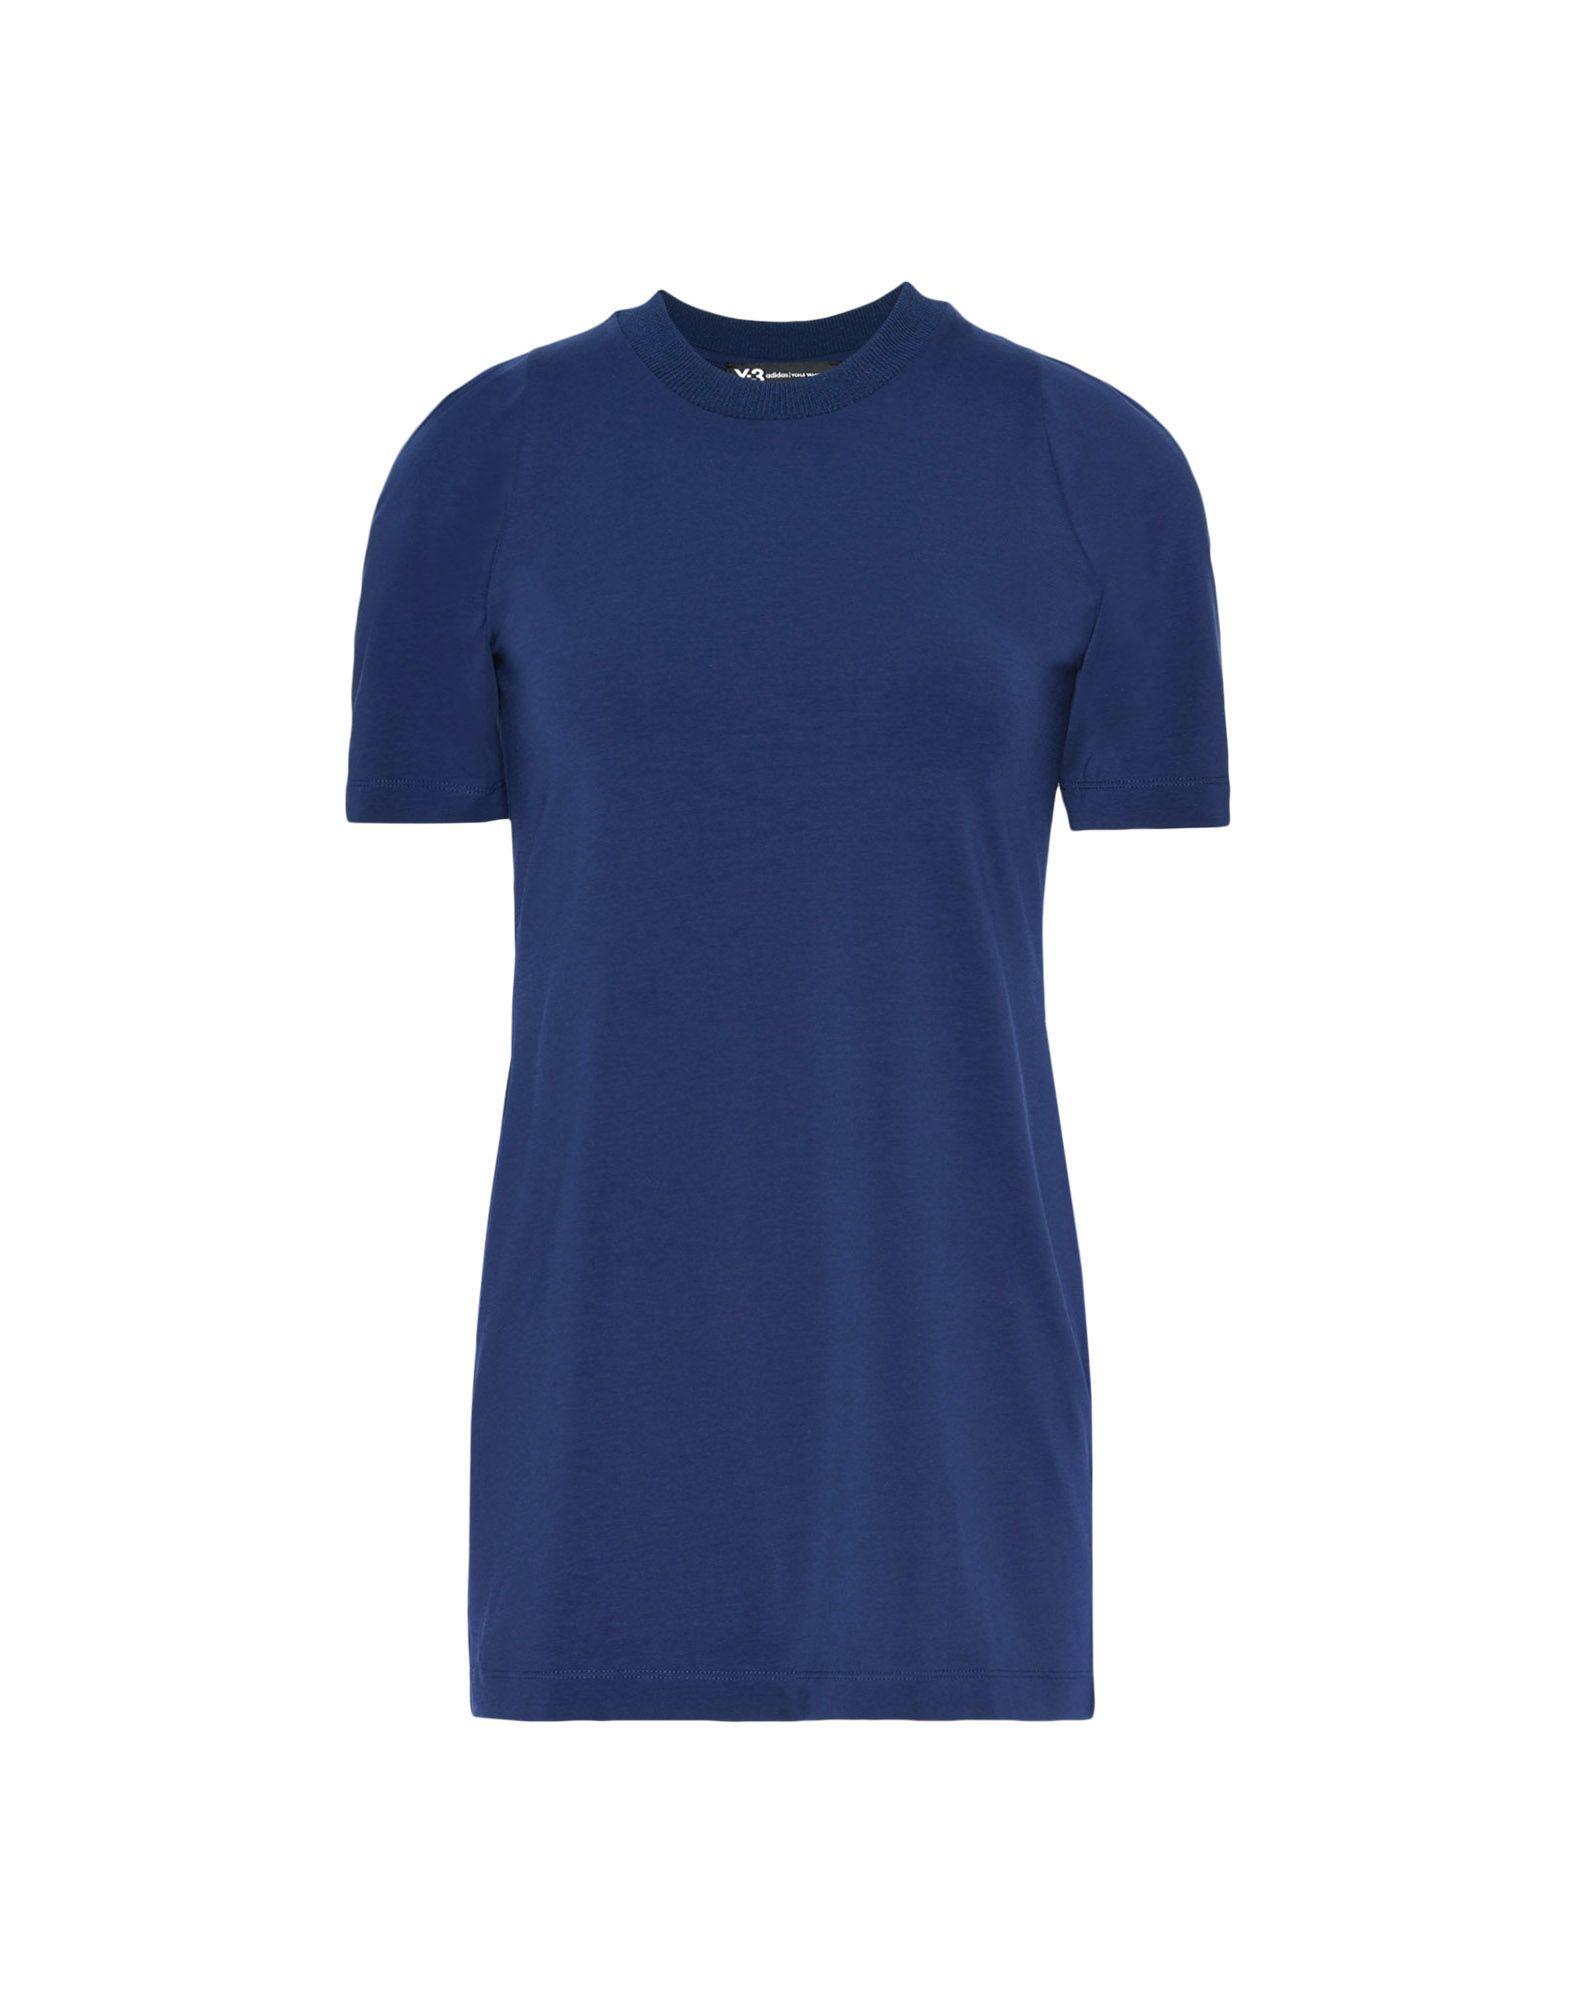 Y-3 Y-3 Prime Tee Short sleeve t-shirt Woman f